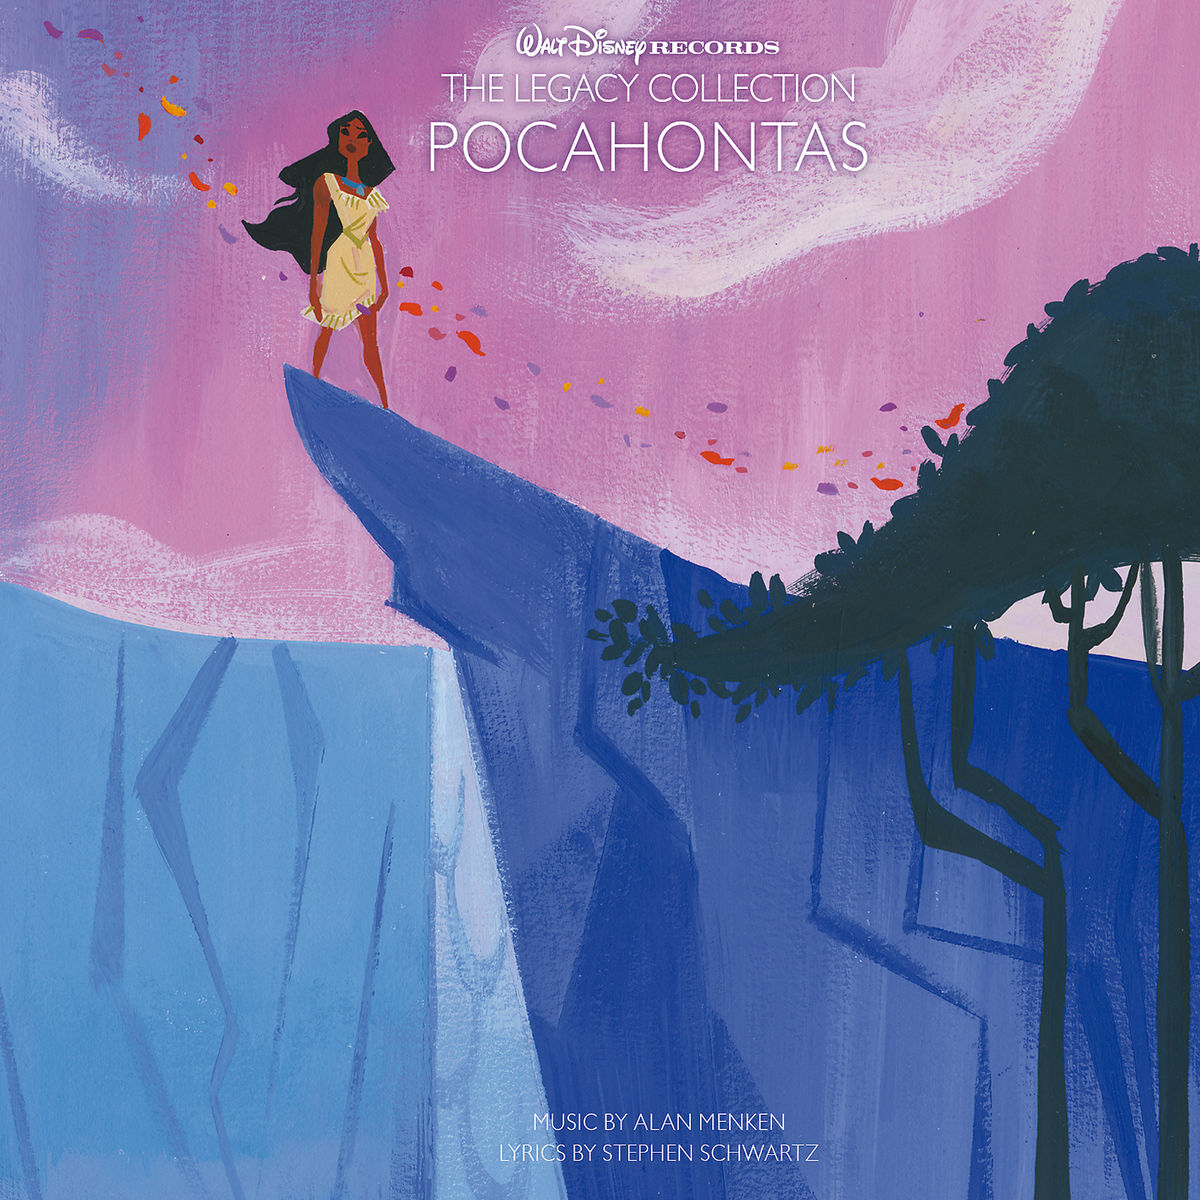 The Legacy Collection: Pocahontas